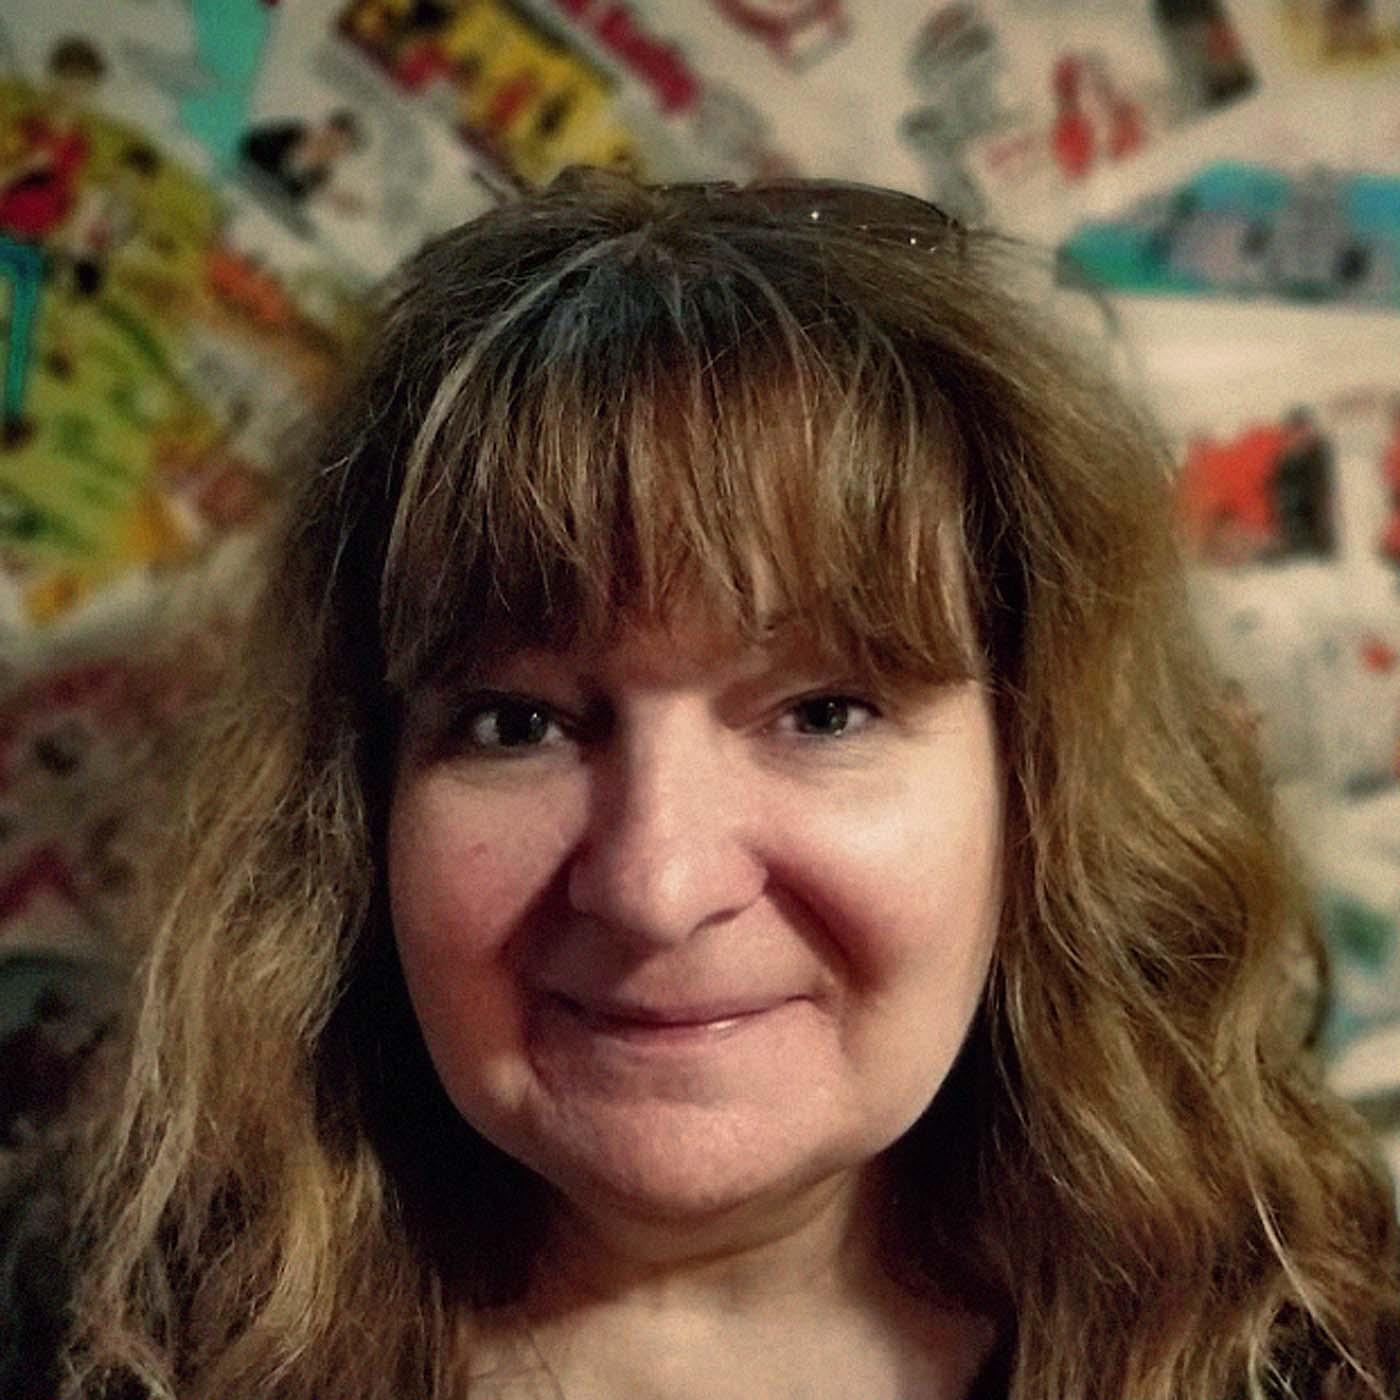 The Comedian's Comedian - 331 – Janey Godley